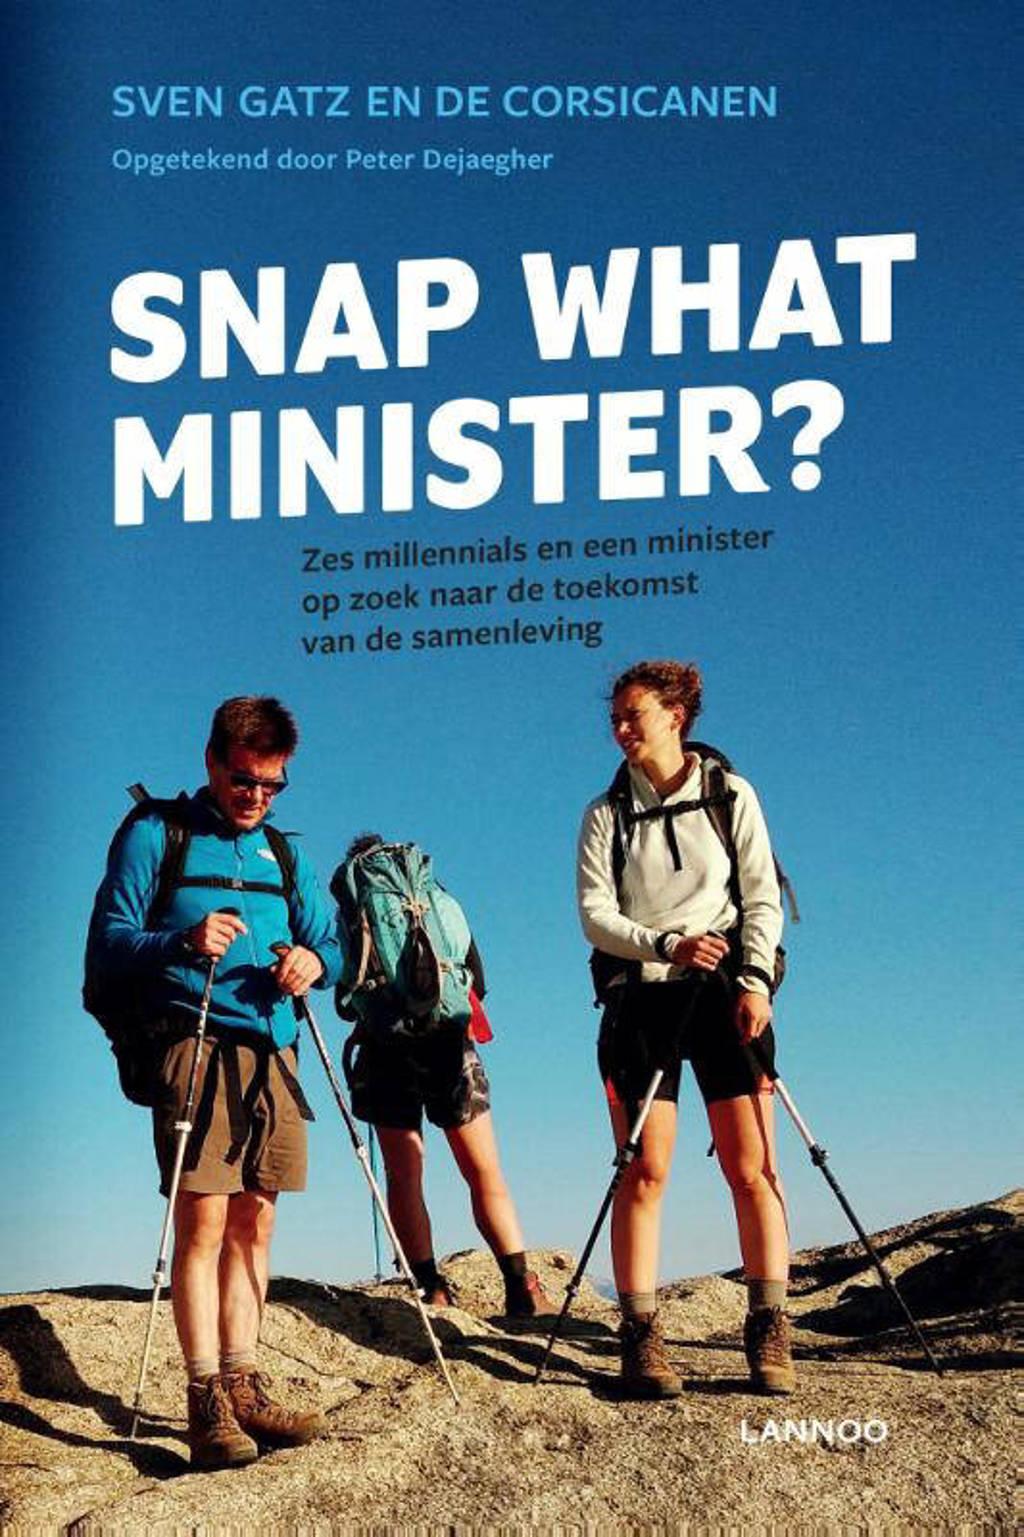 Snap what minister? - Sven Gatz en De Corsicanen